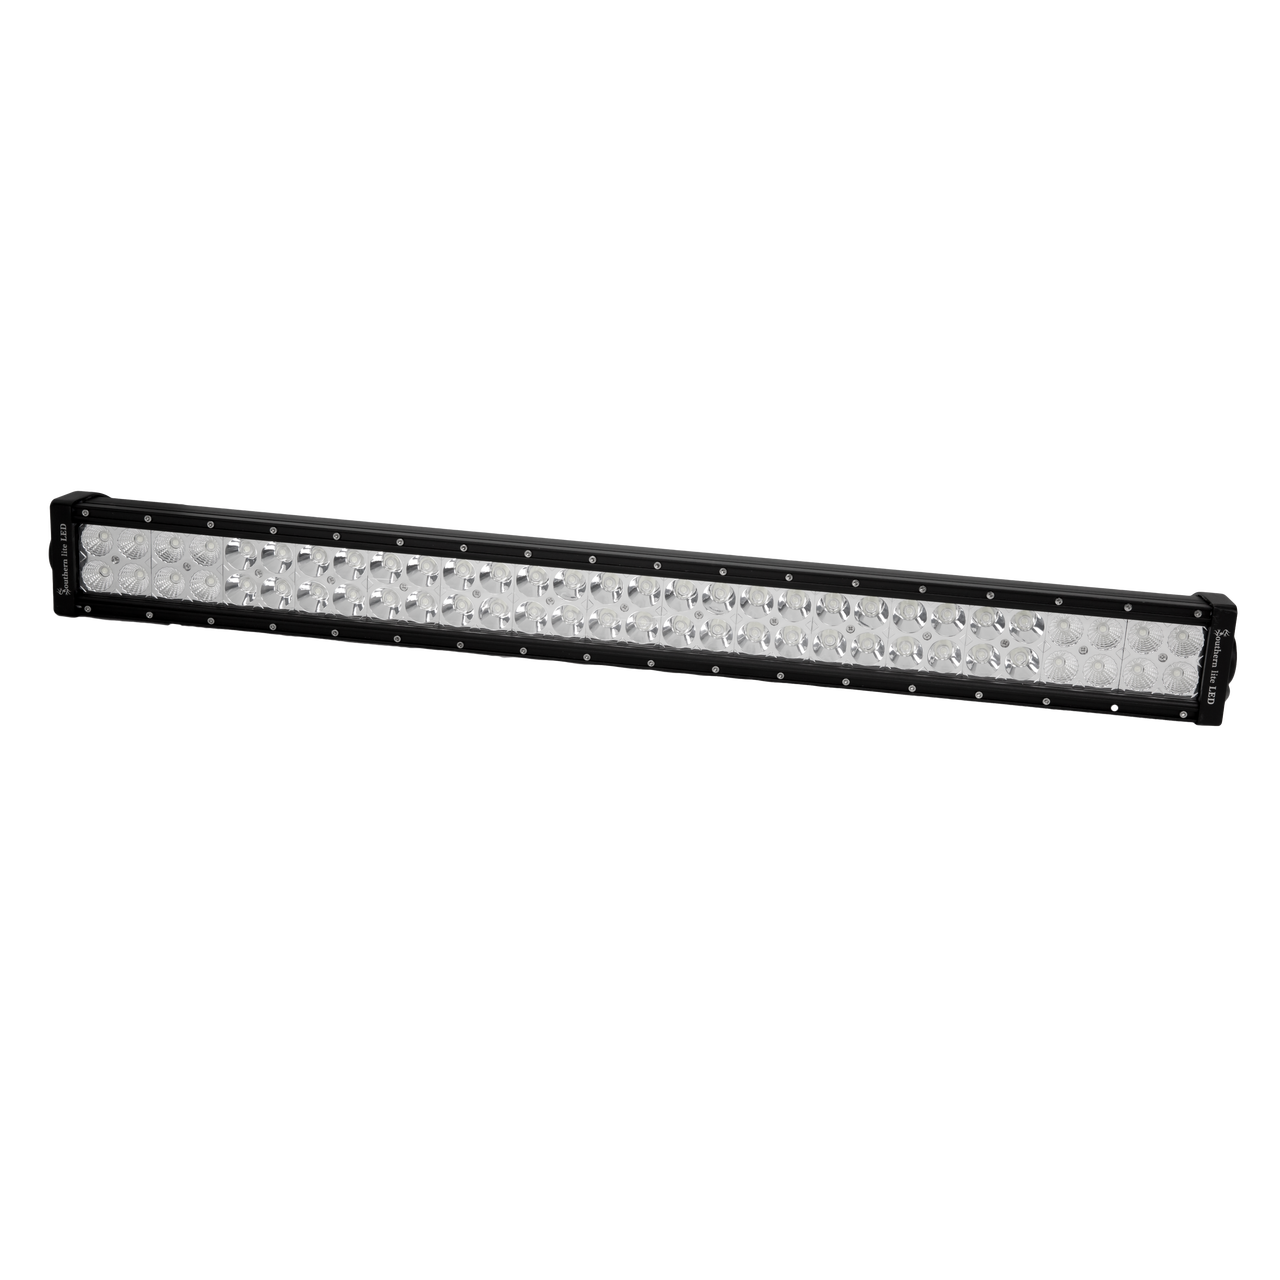 "DND Colored Hunting 30"" LED Light Bar"